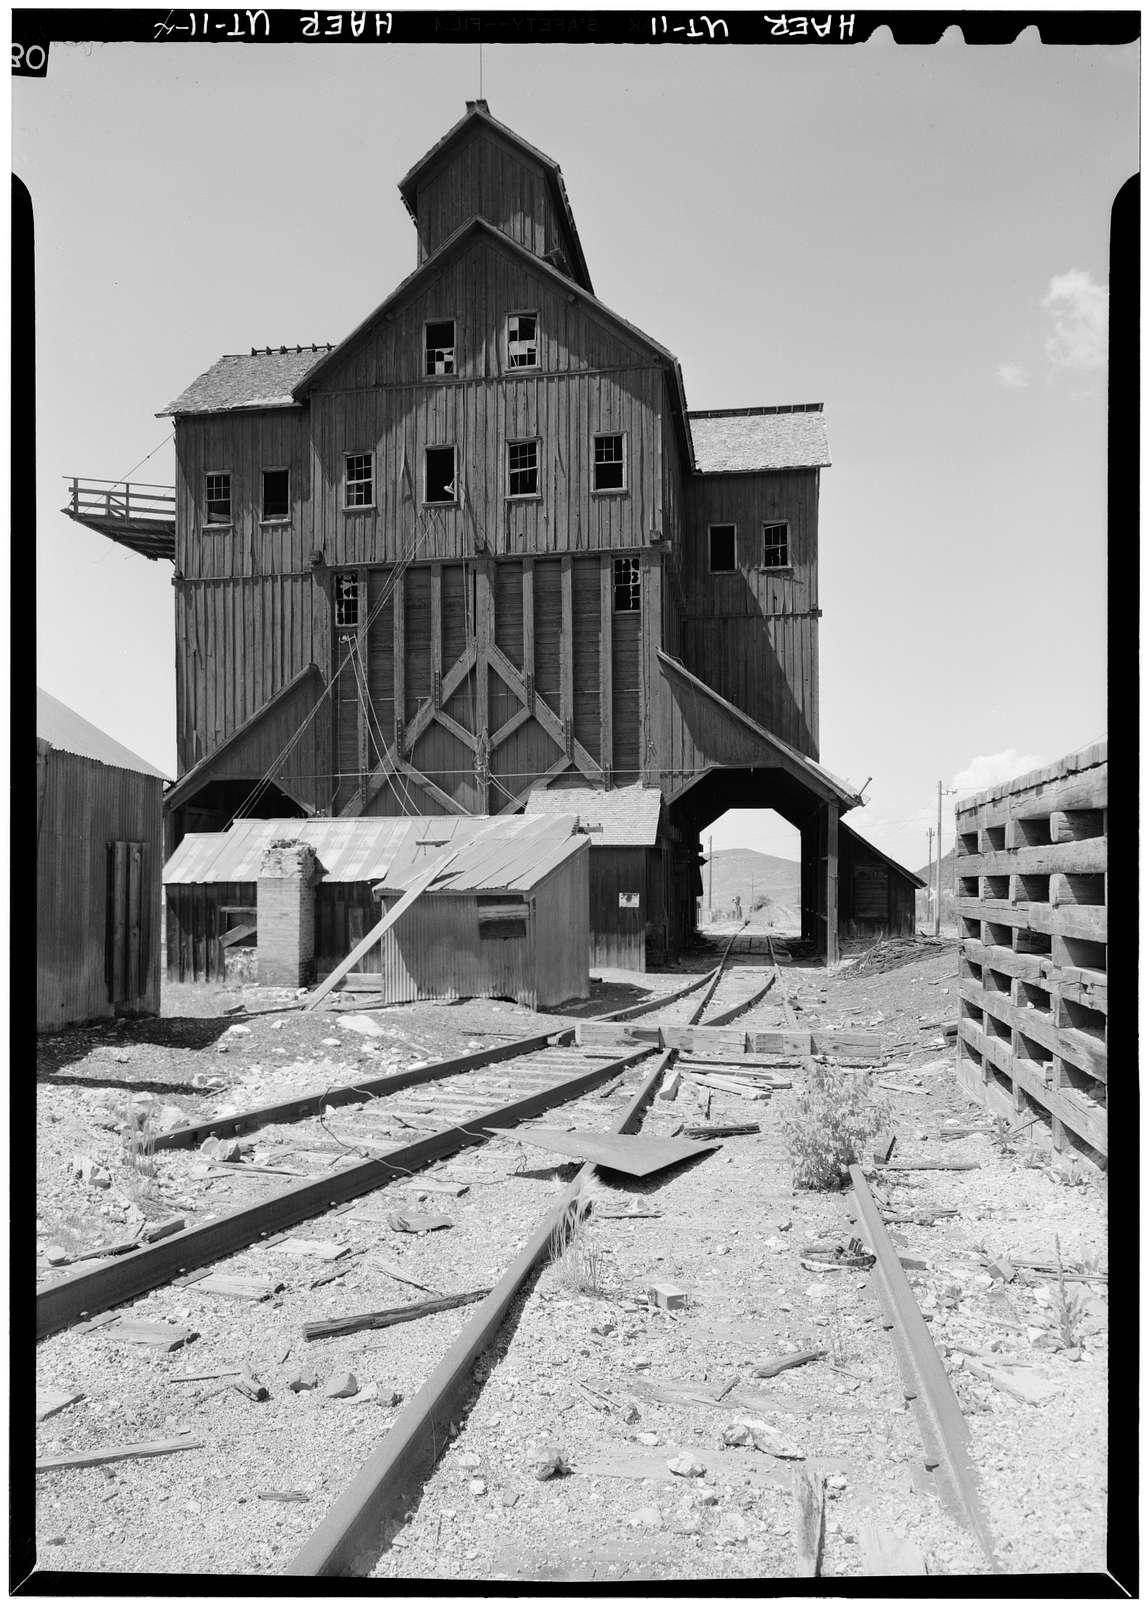 Silver King Mining Company, Ore Loading Station, Park Avenue, Park City, Summit County, UT